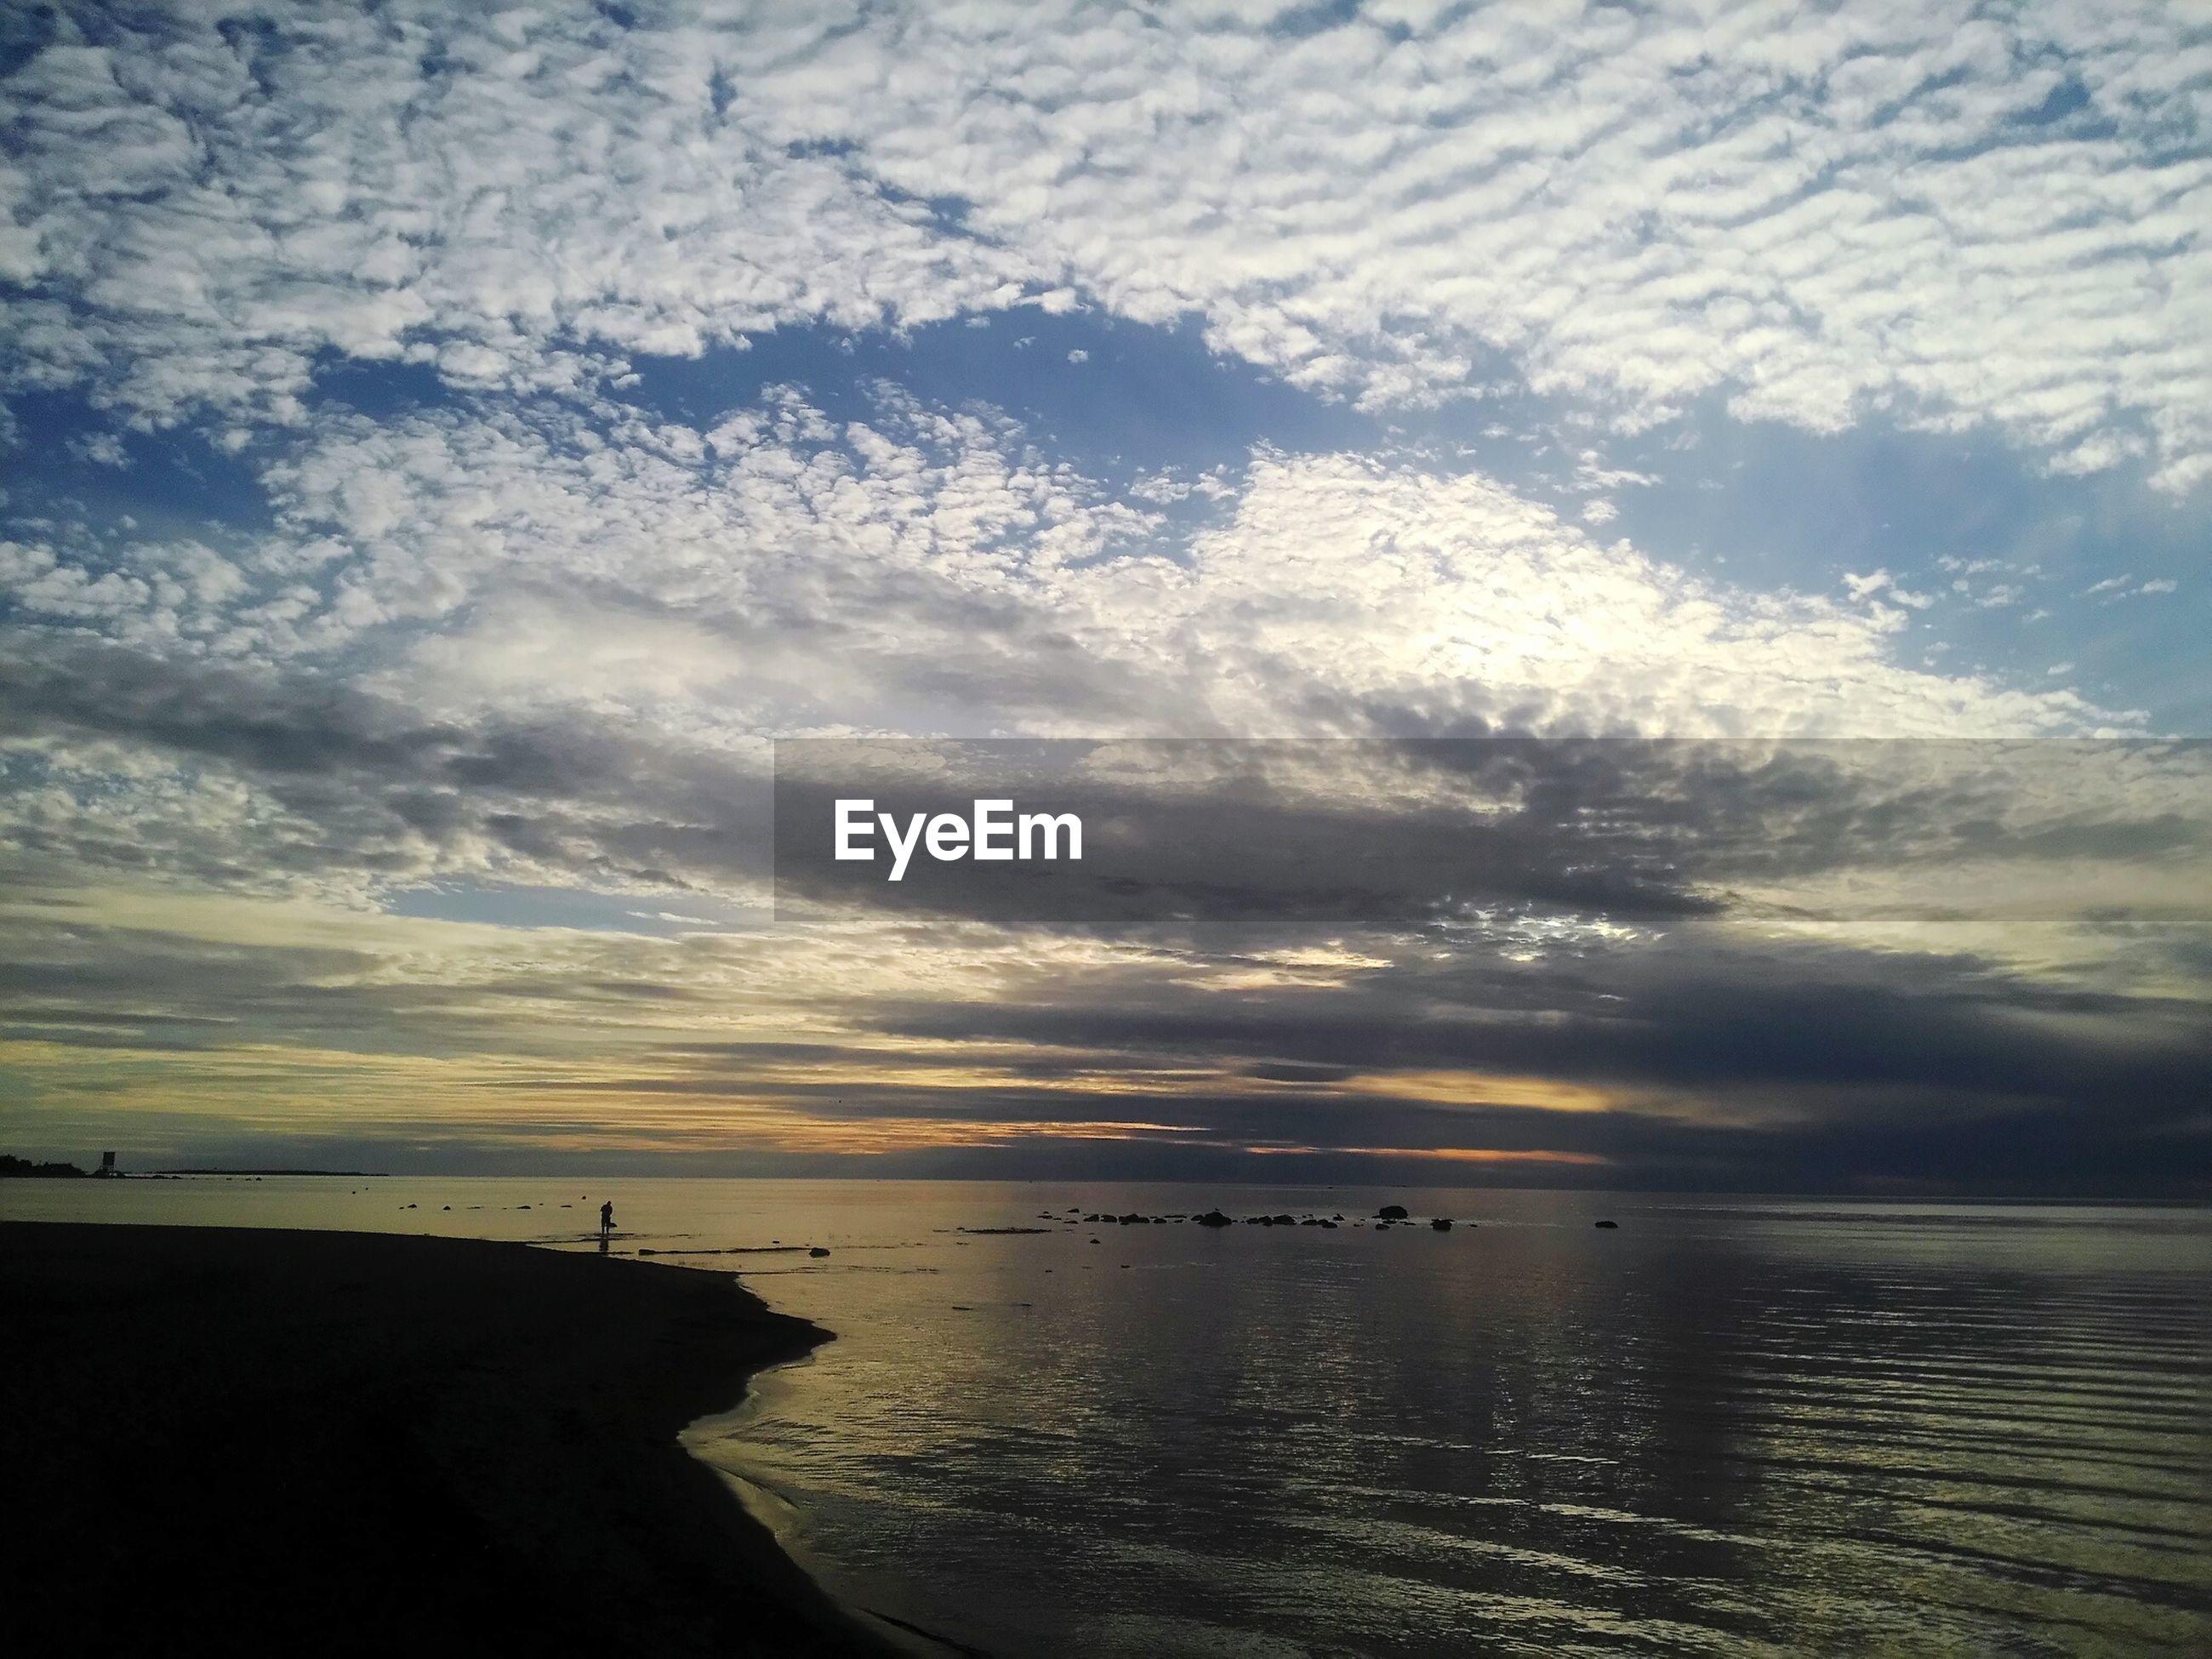 View of calm sea below cloudy sky